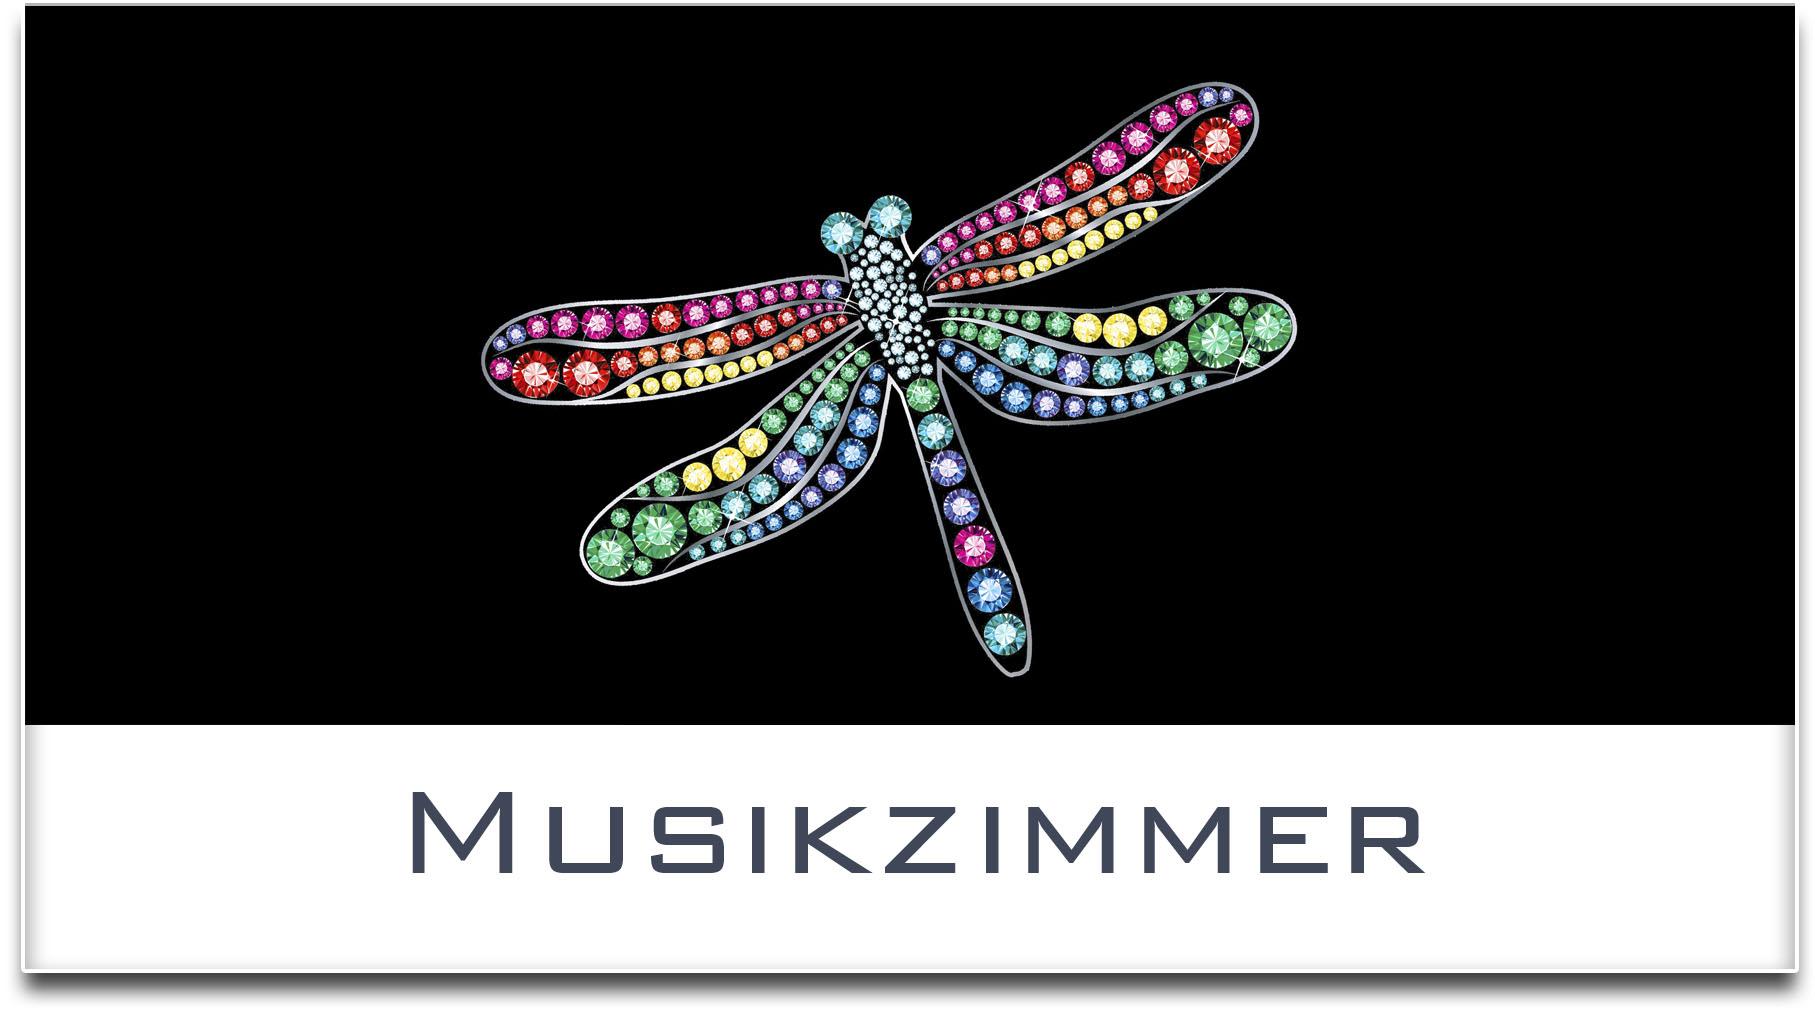 Türschild / Haustürschild / Libelle / Musikzimmer / Selbstklebend